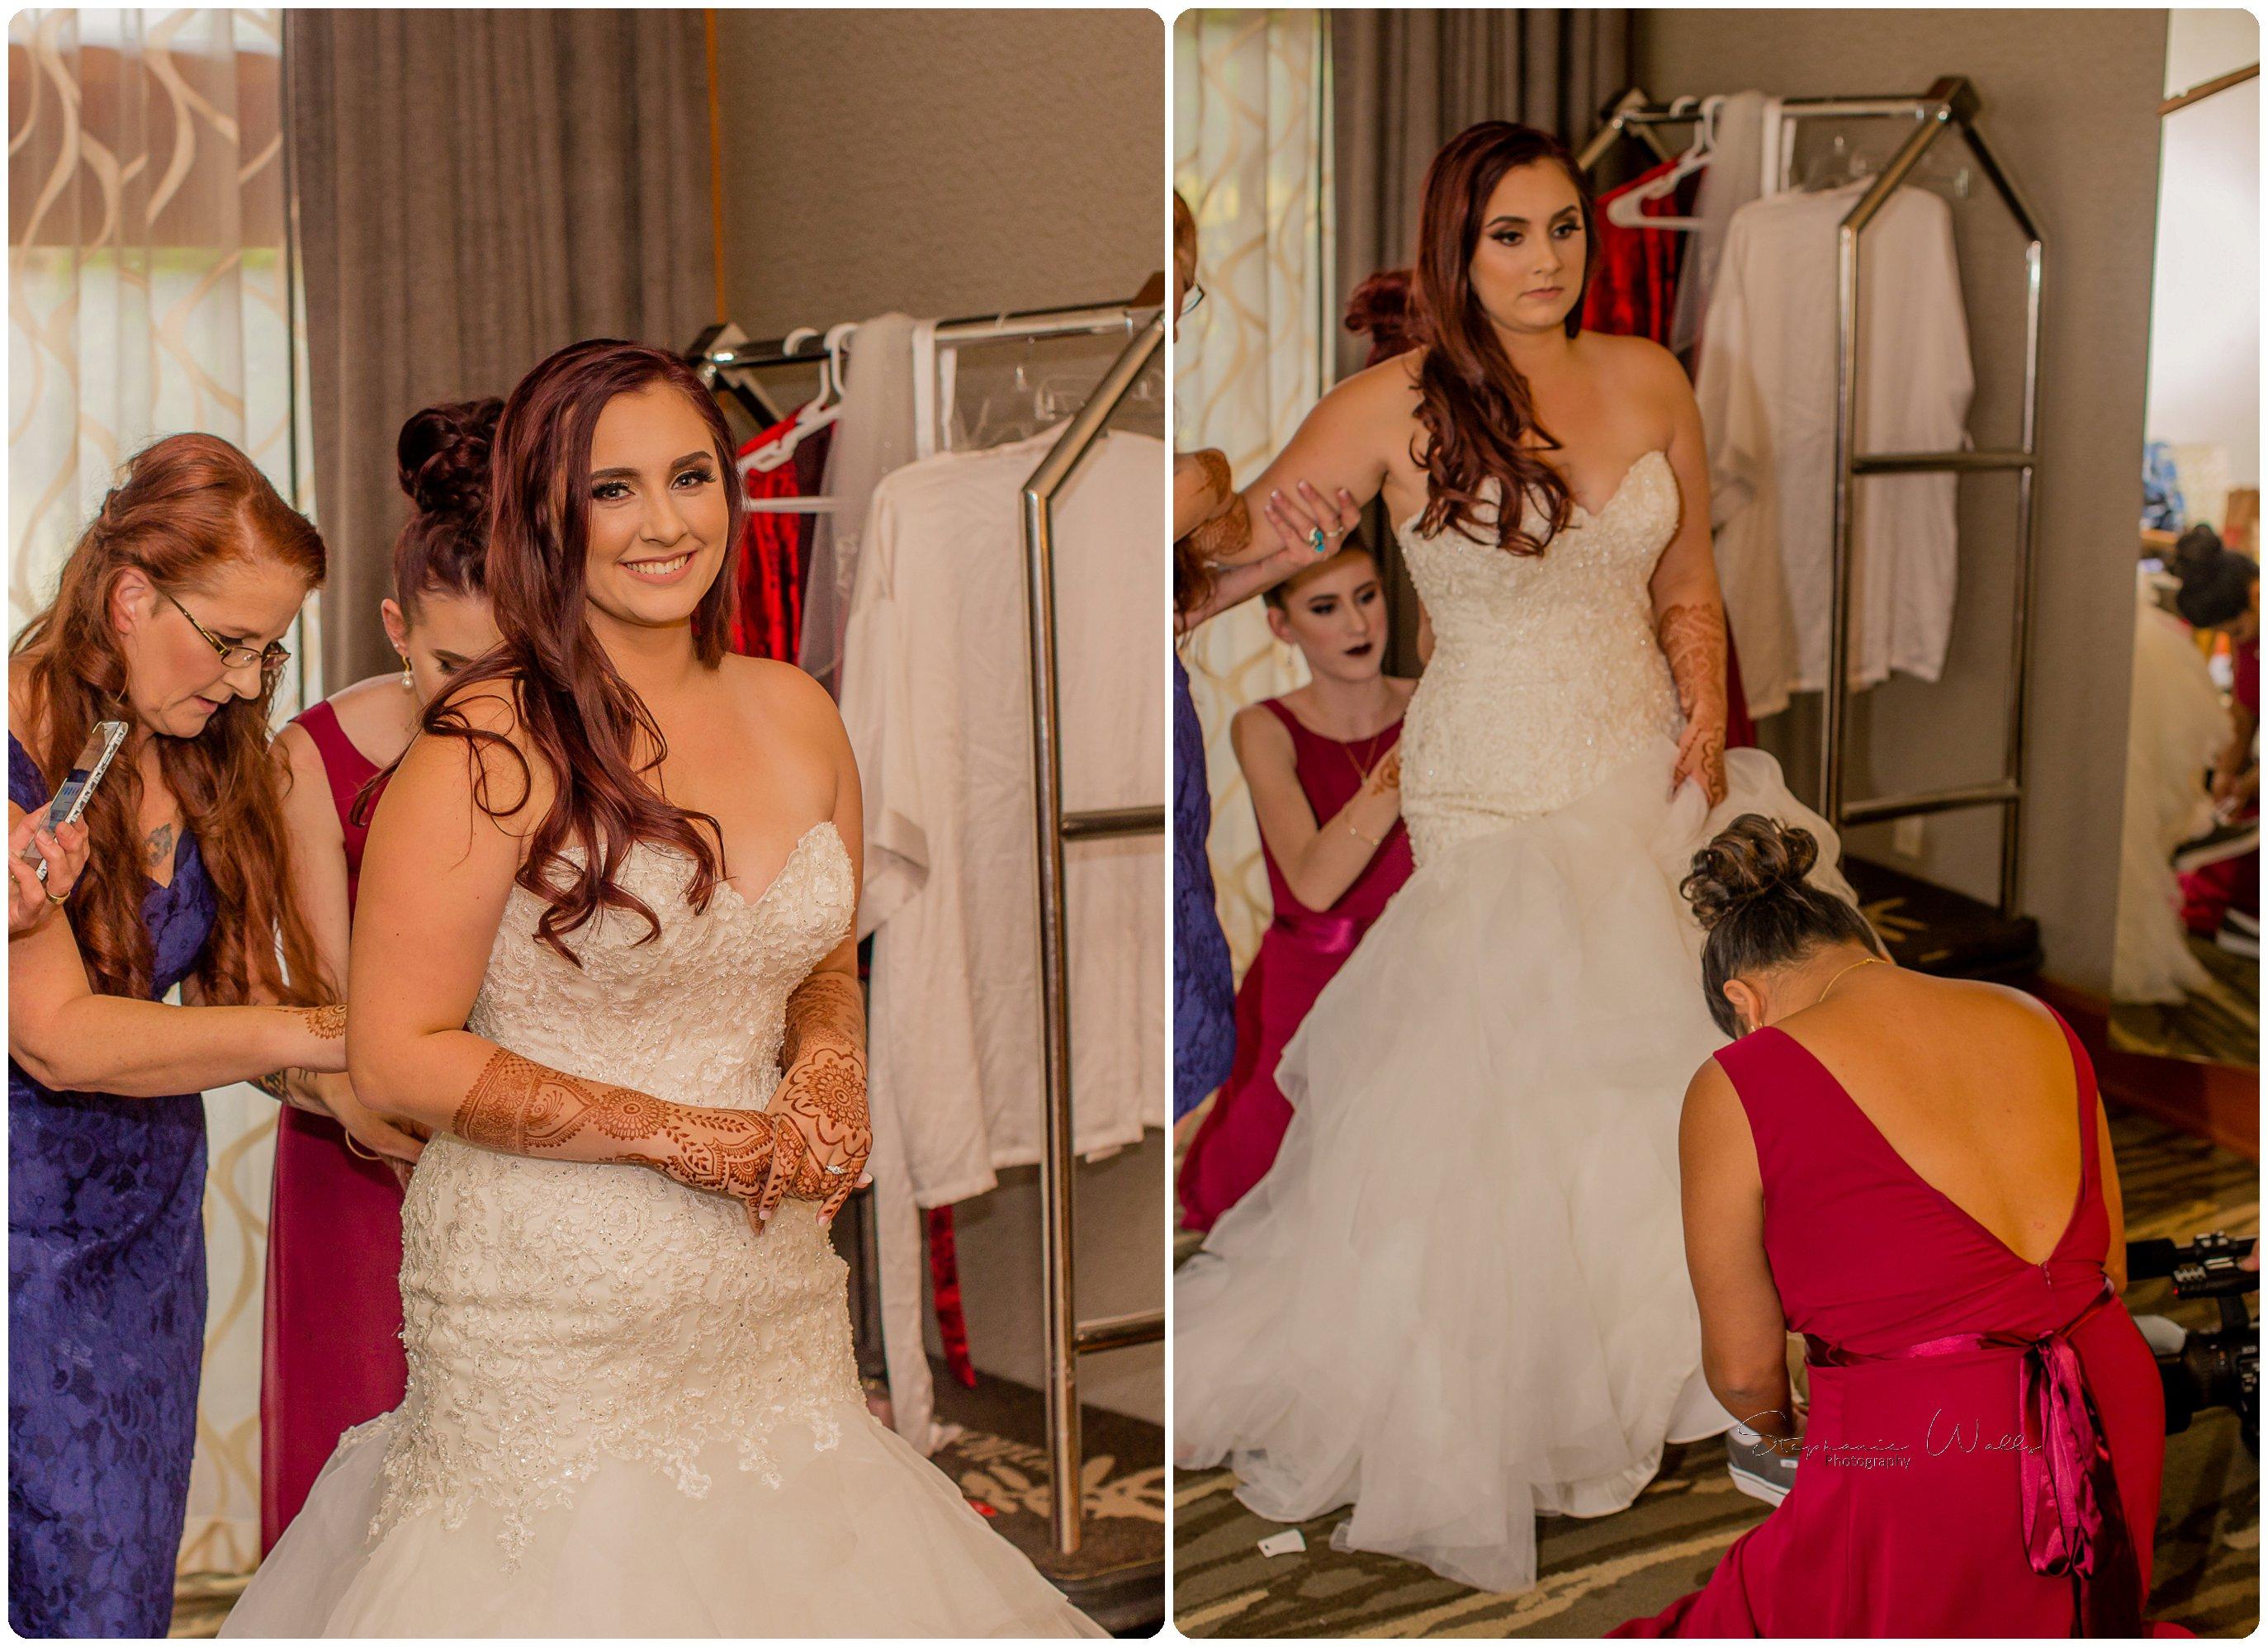 Bride Bridesmaids 062 1 Megan & Mo's Day 2   Willow Lodge Wedding   Woodinville, Wa Wedding Photographer